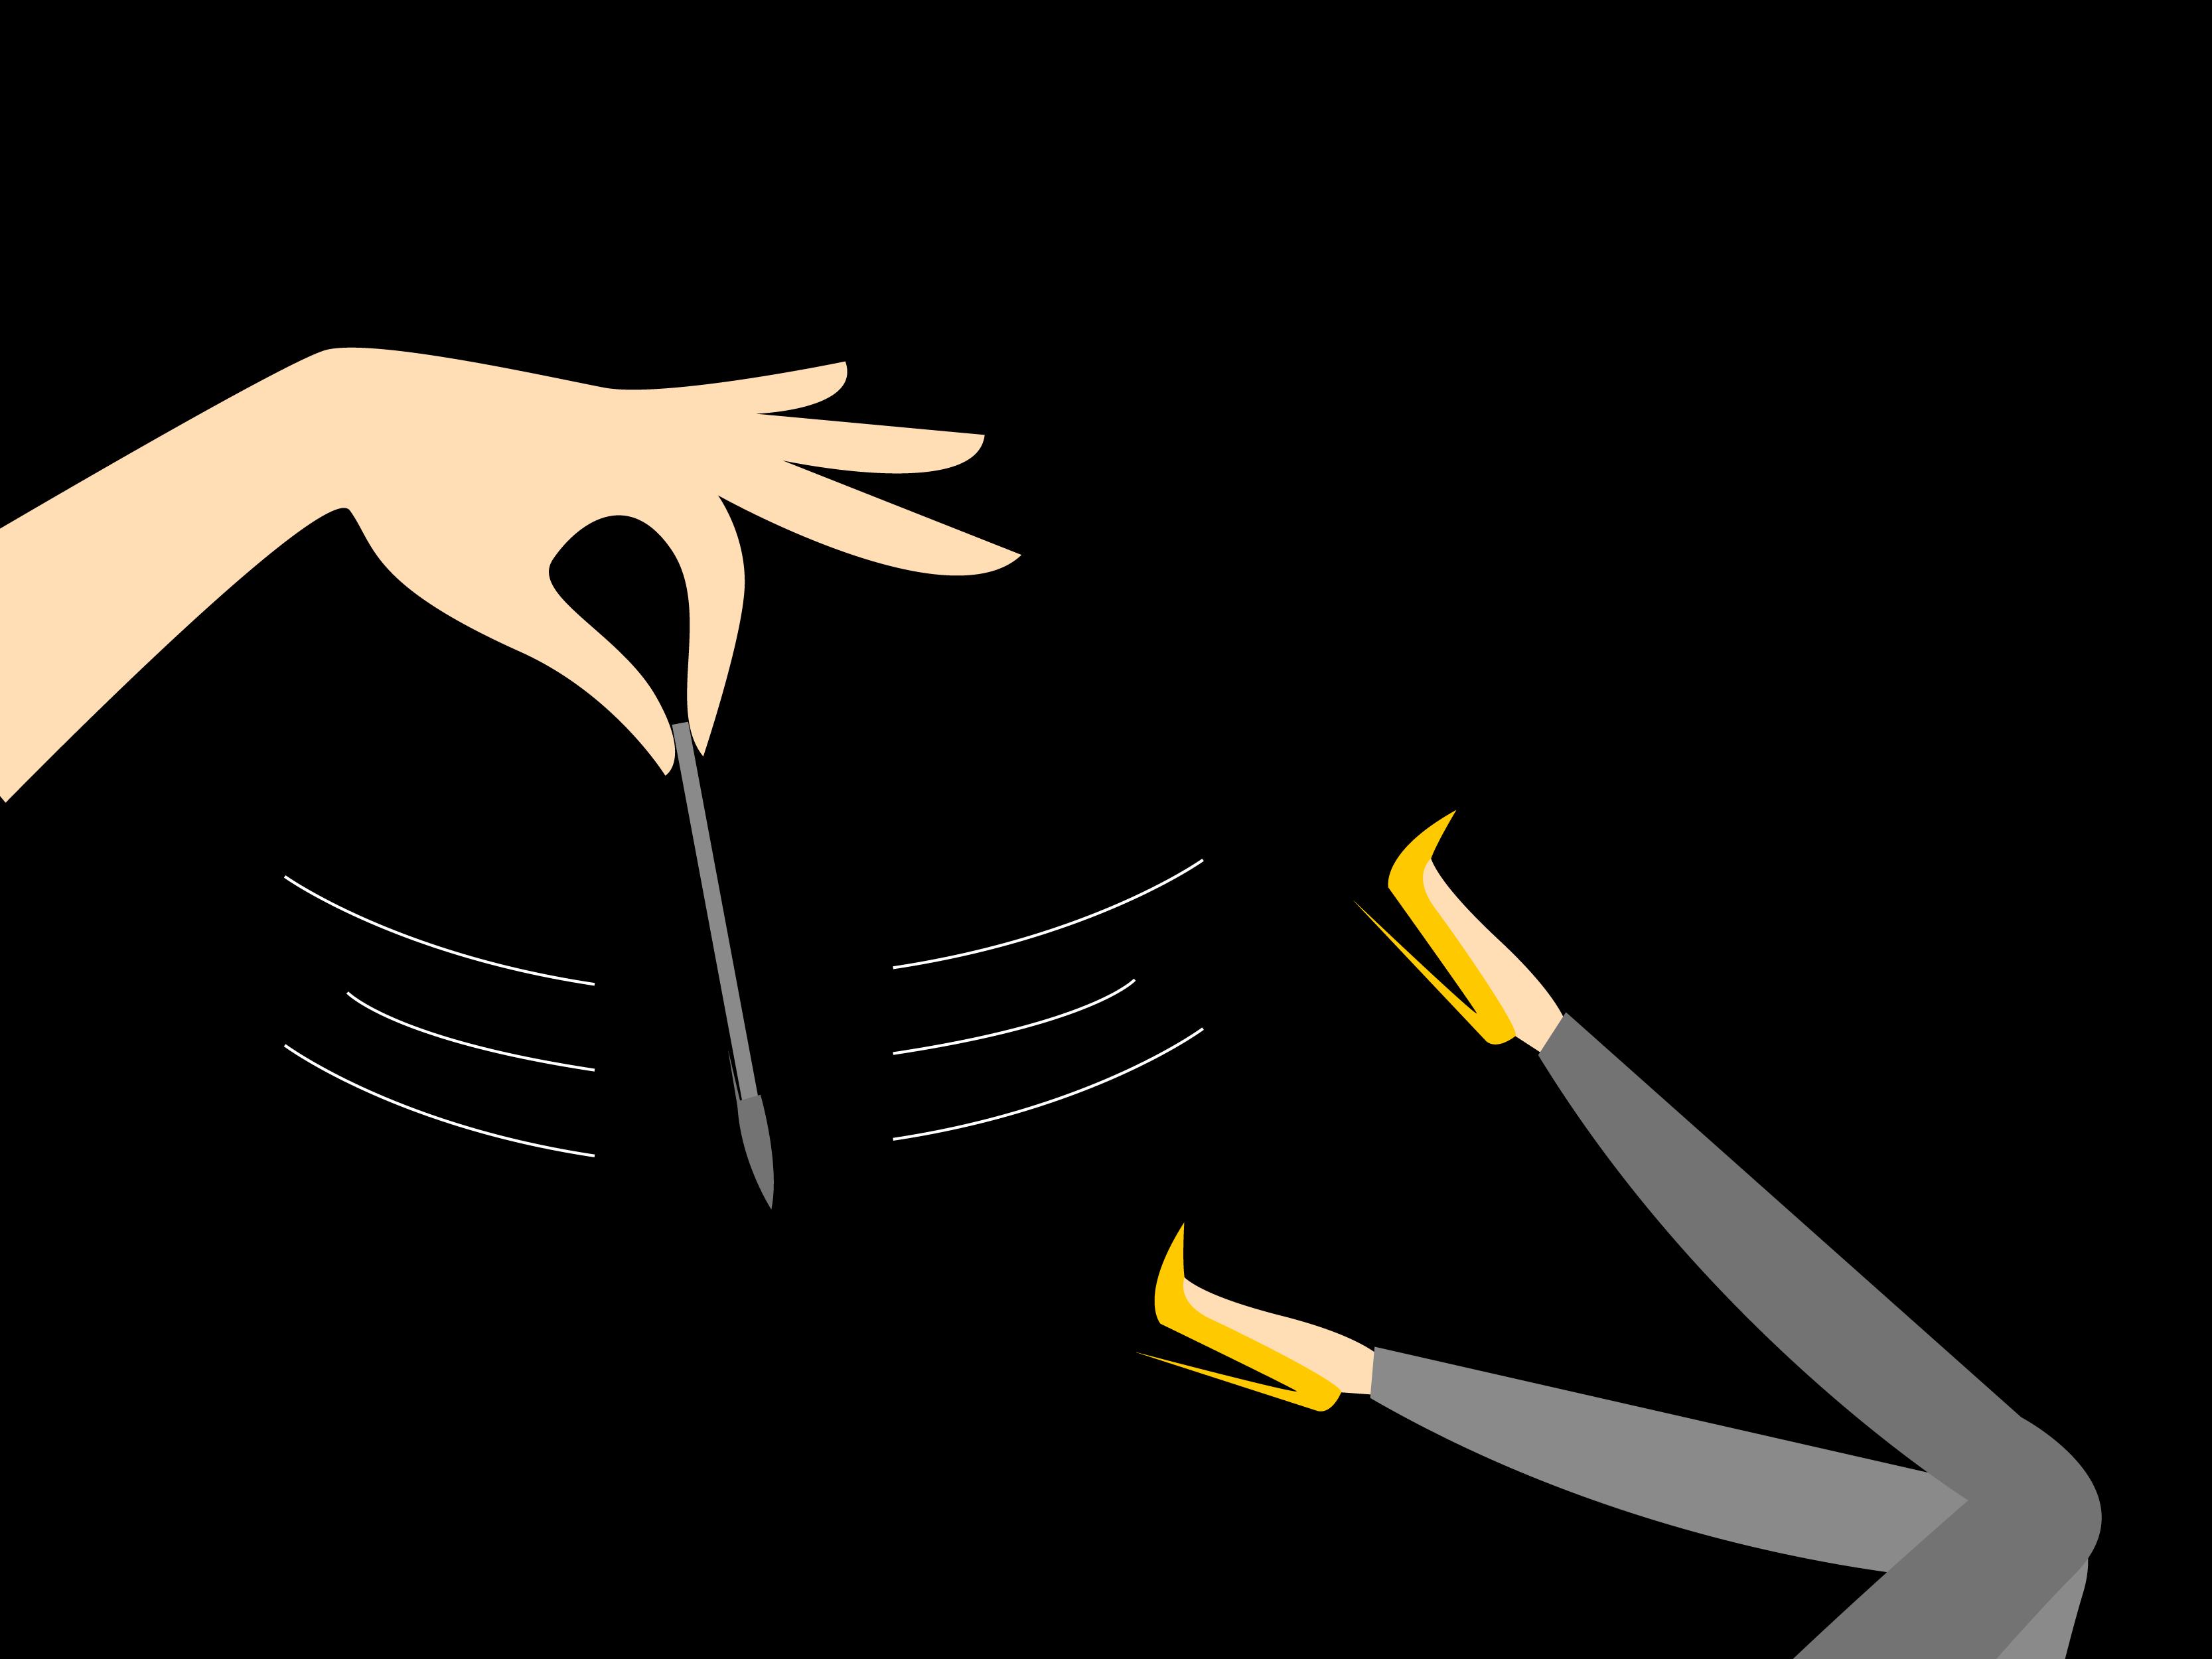 kamasutra du bureau illustration par charlie la freelance